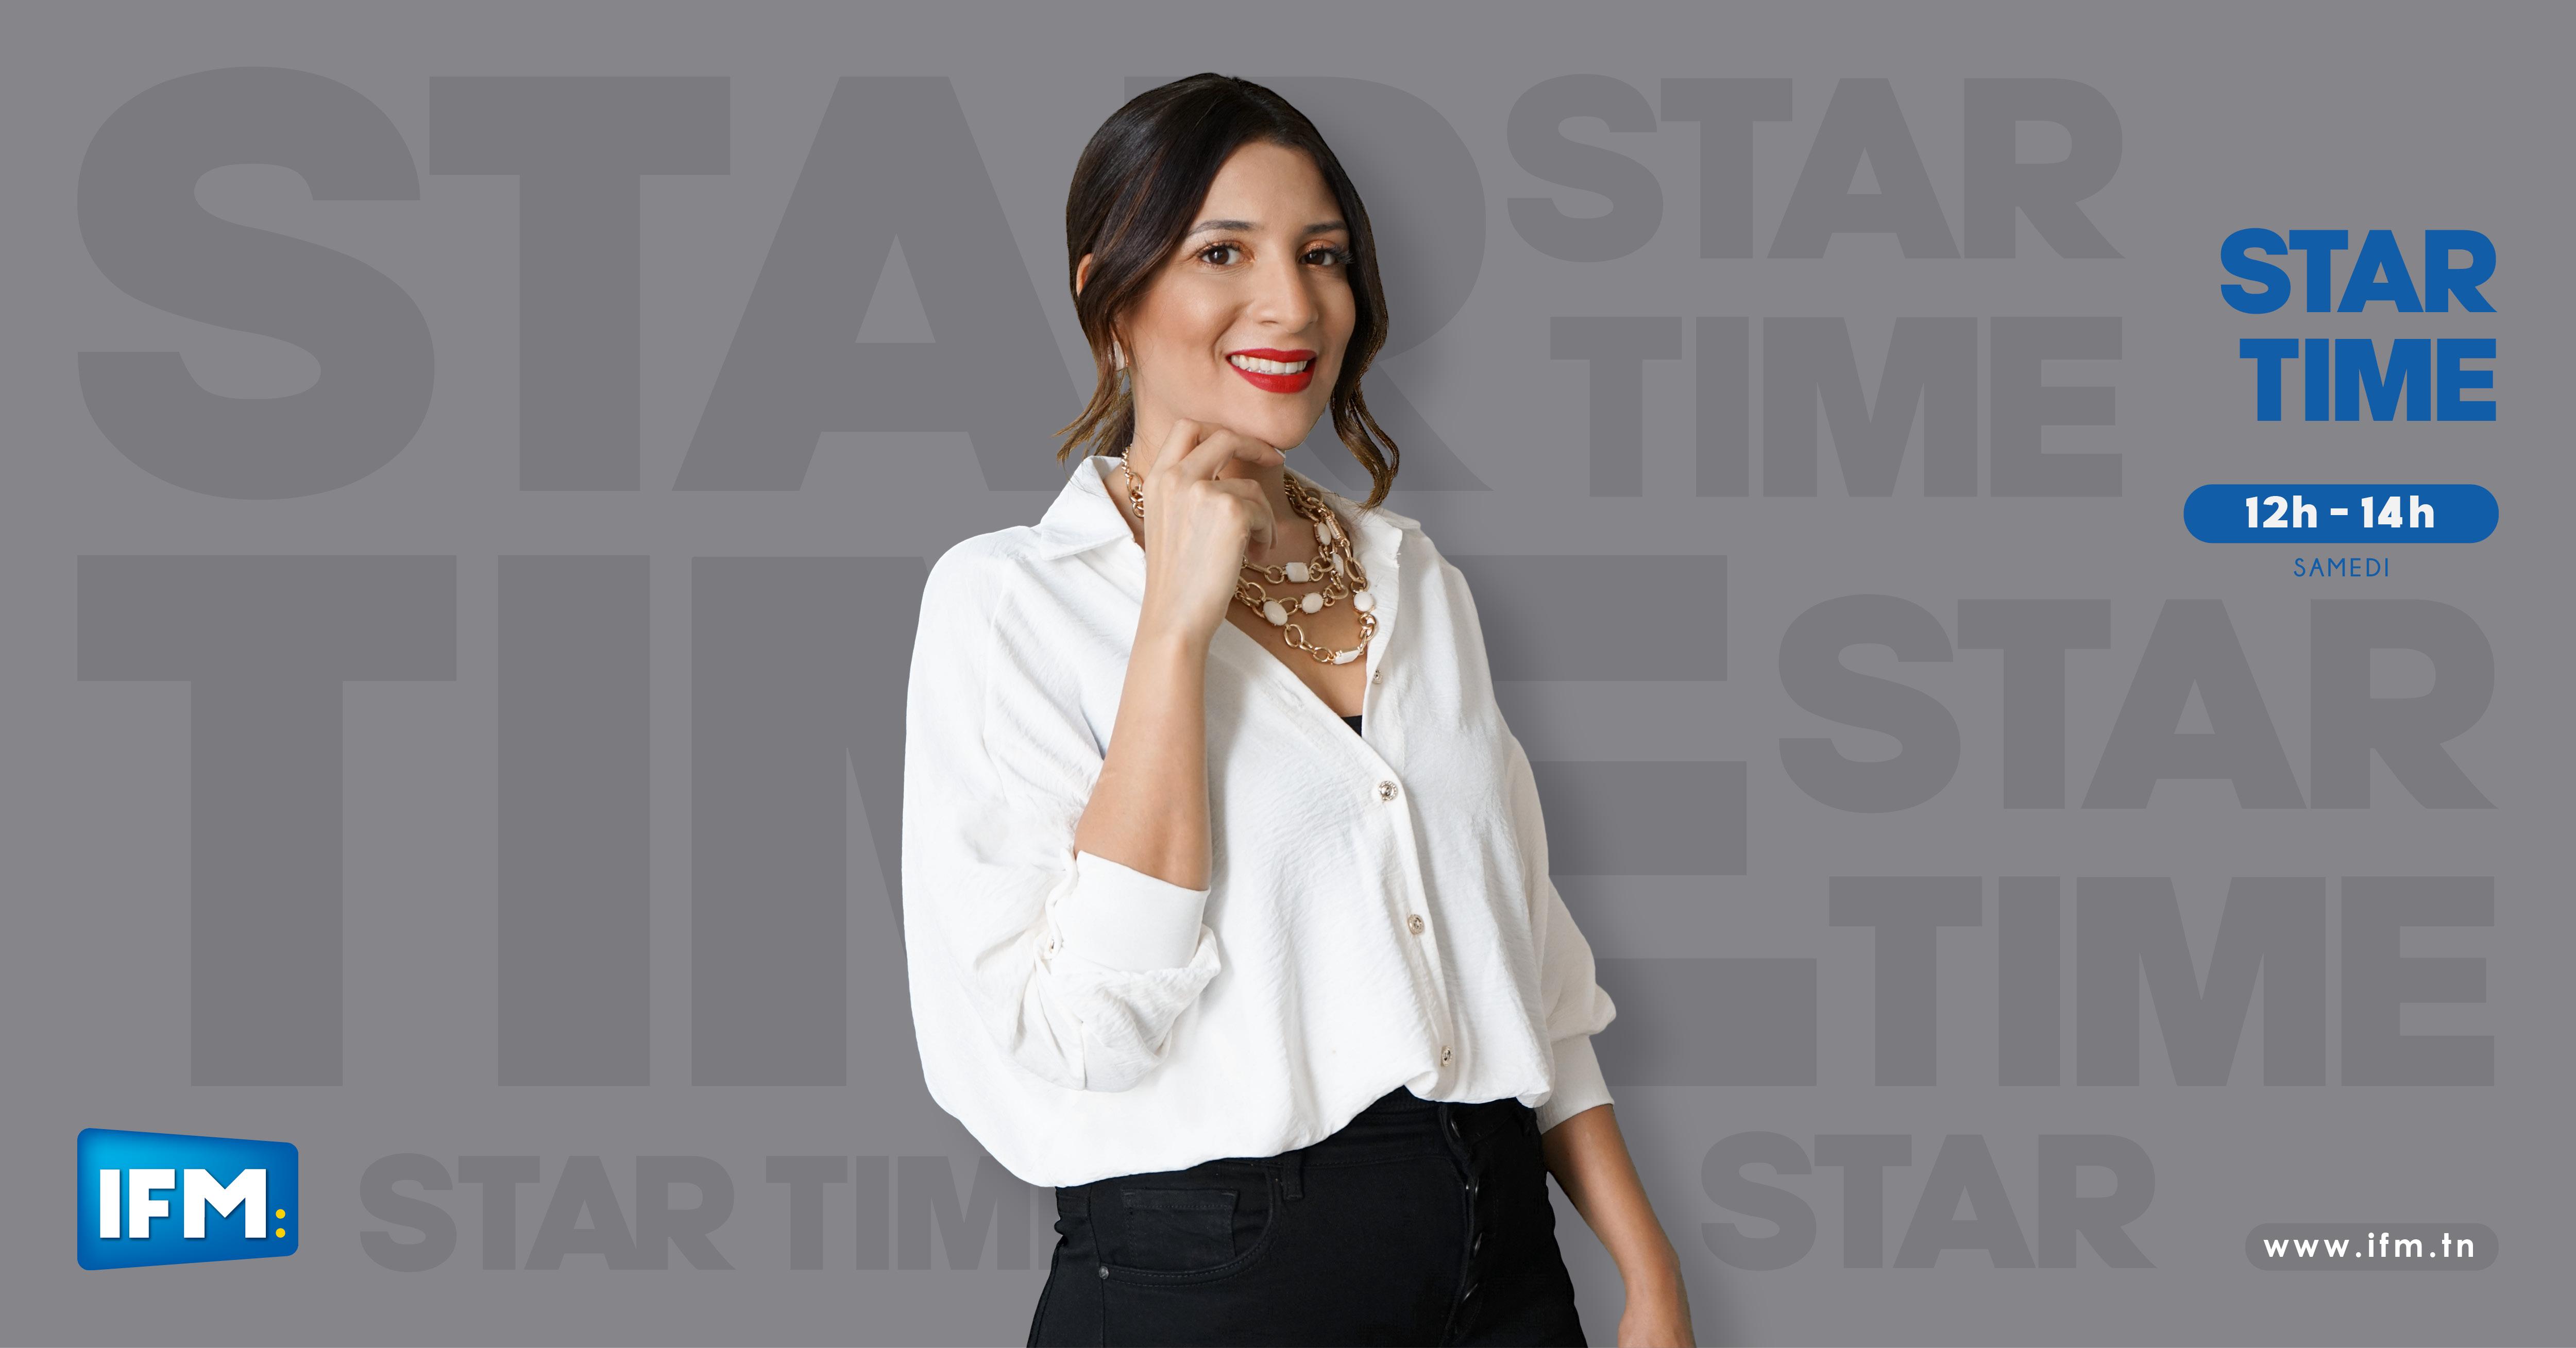 Star time Star Time du 27 03 2021